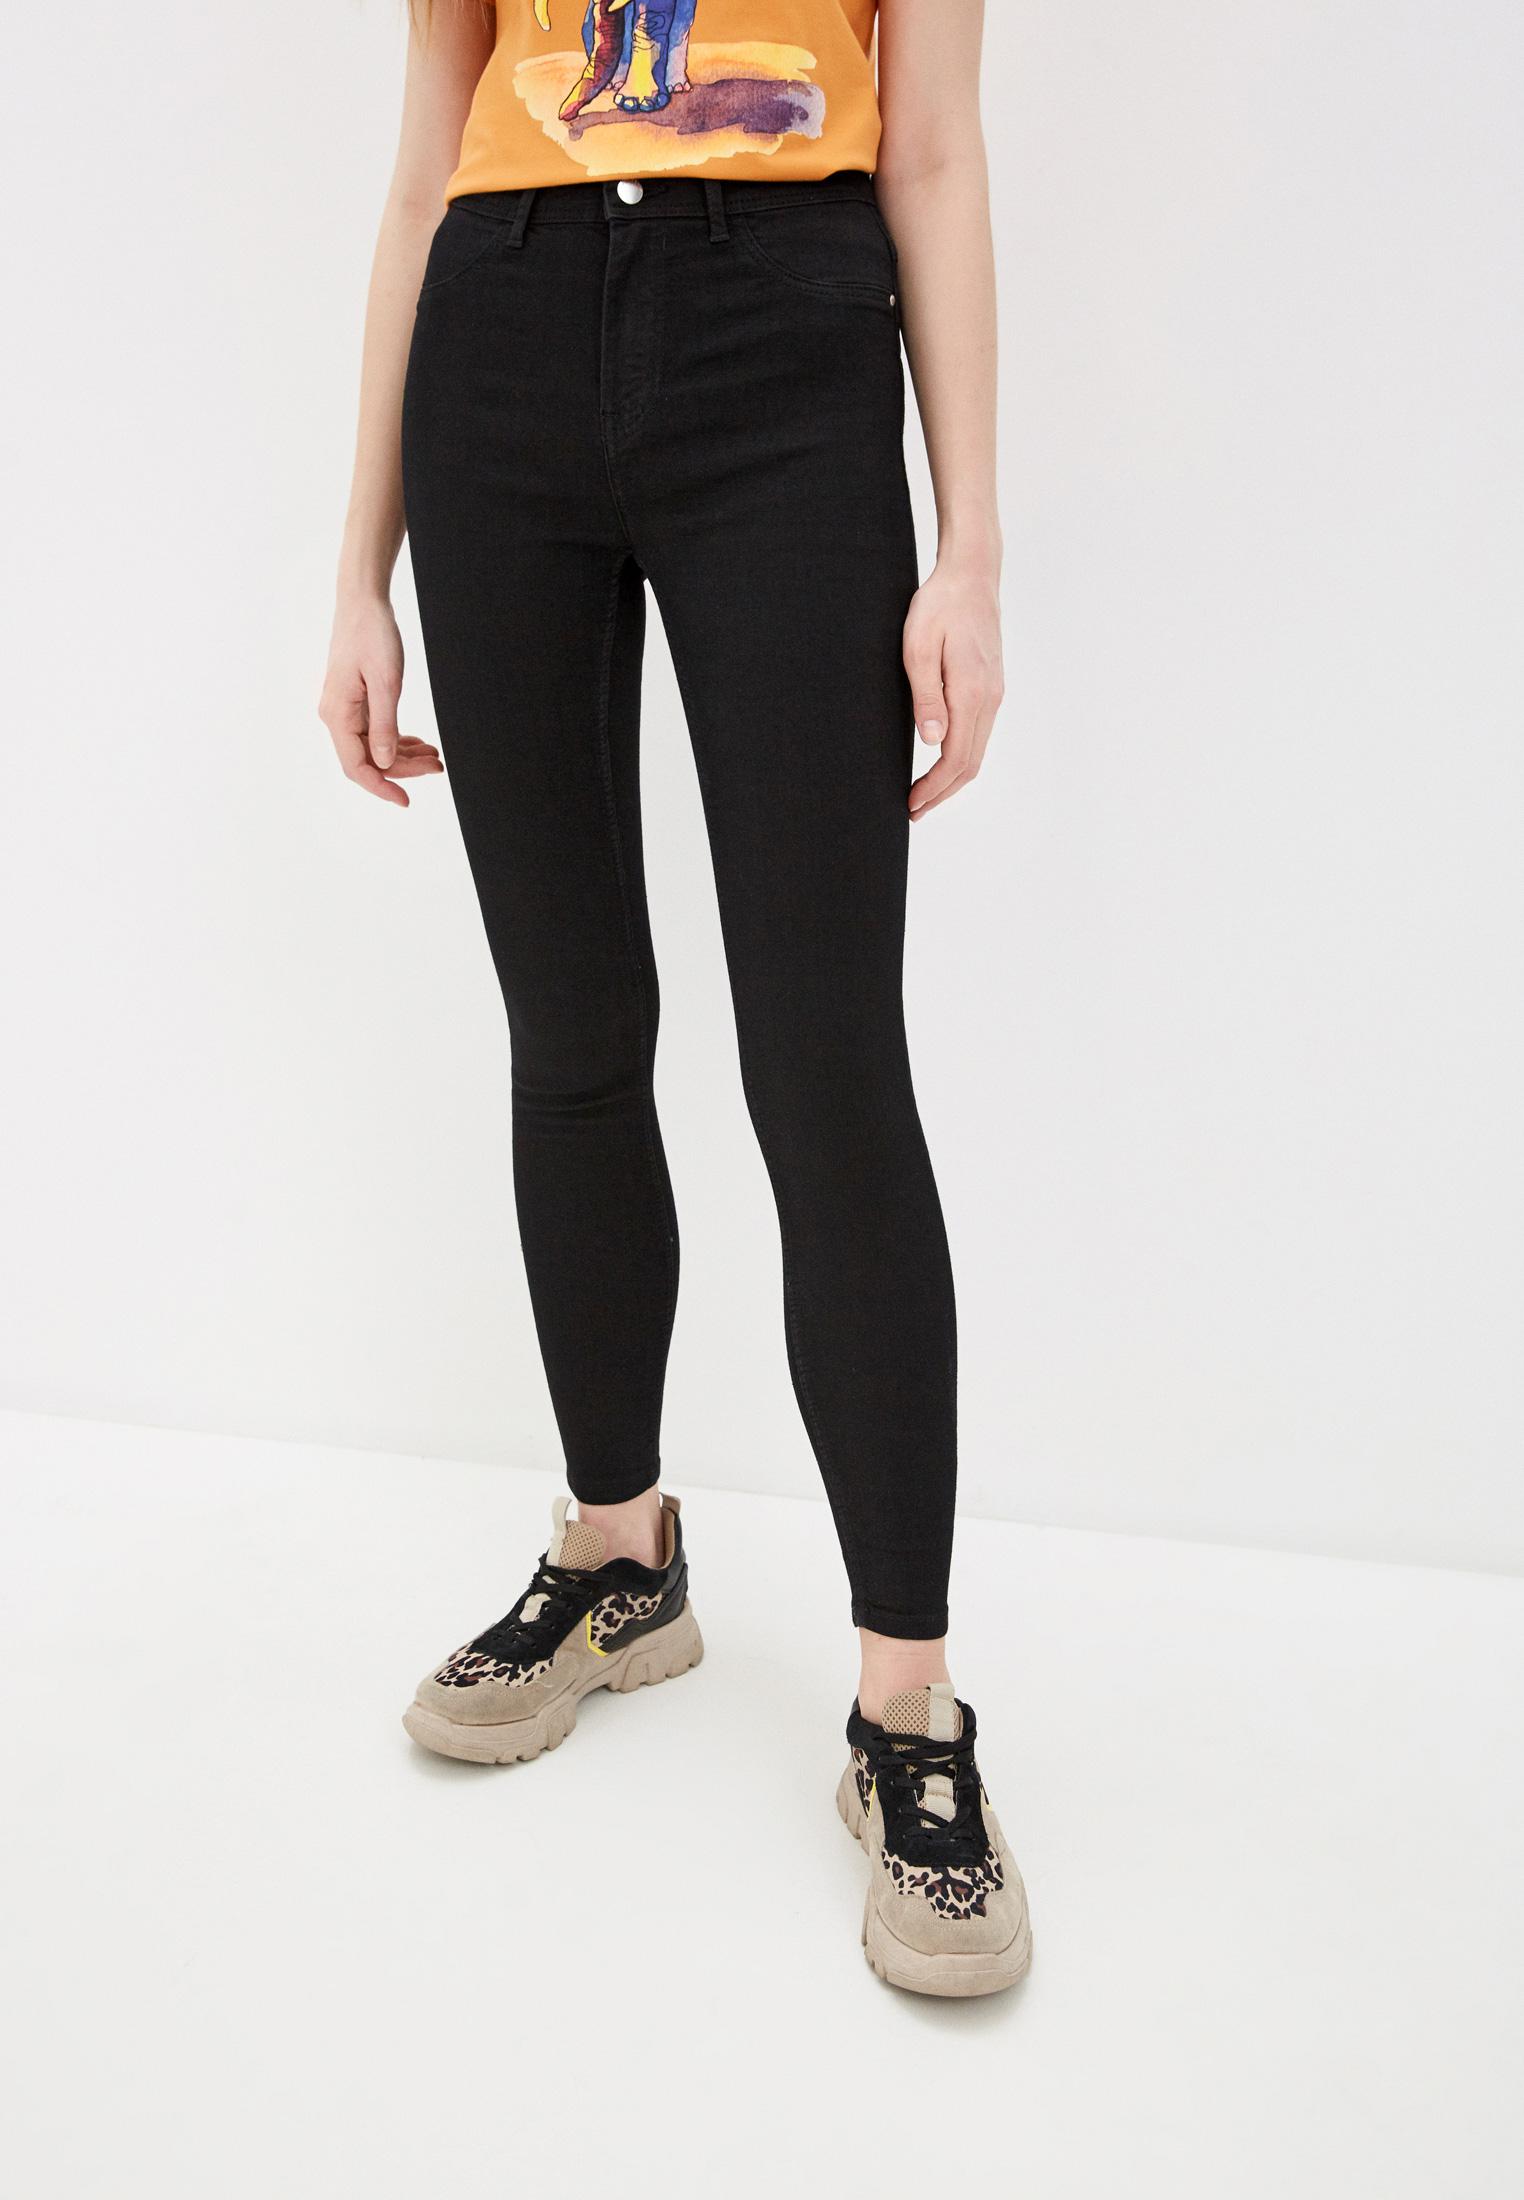 Pantaloni Business TG 40 nero lunga Aniston Pantaloni High Waist comodamente NUOVO